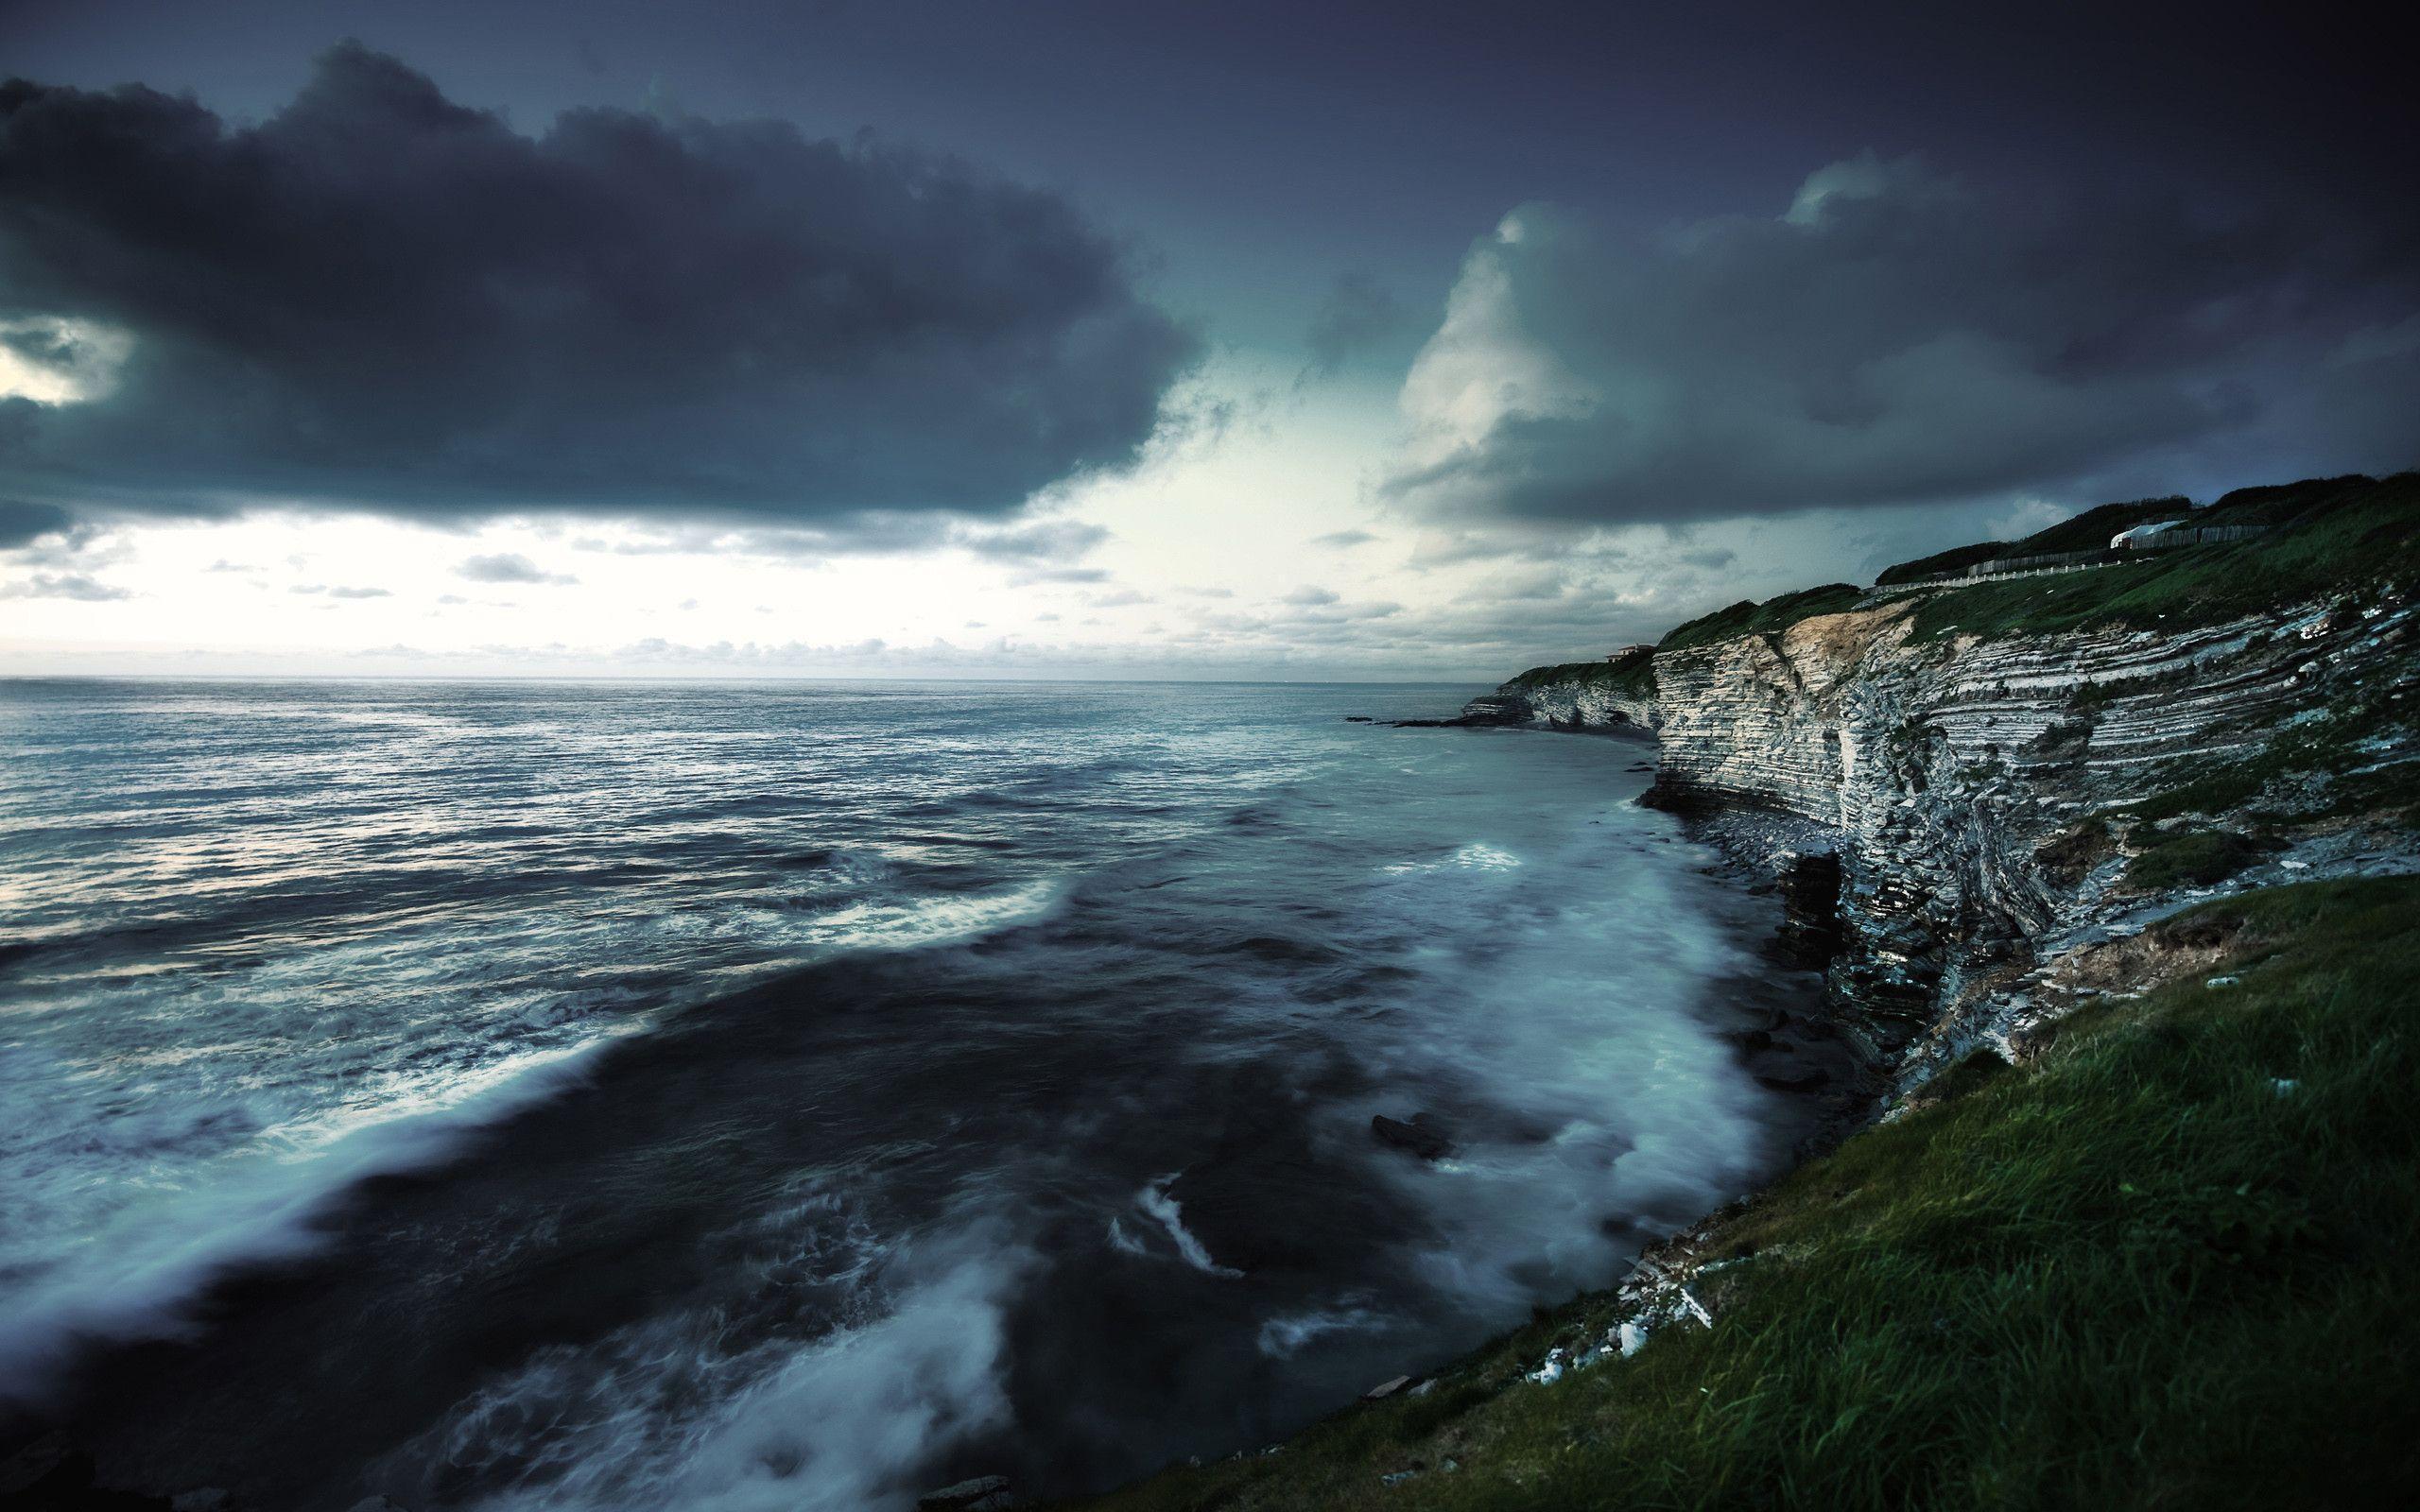 1438 ocean hd wallpapers - photo #18